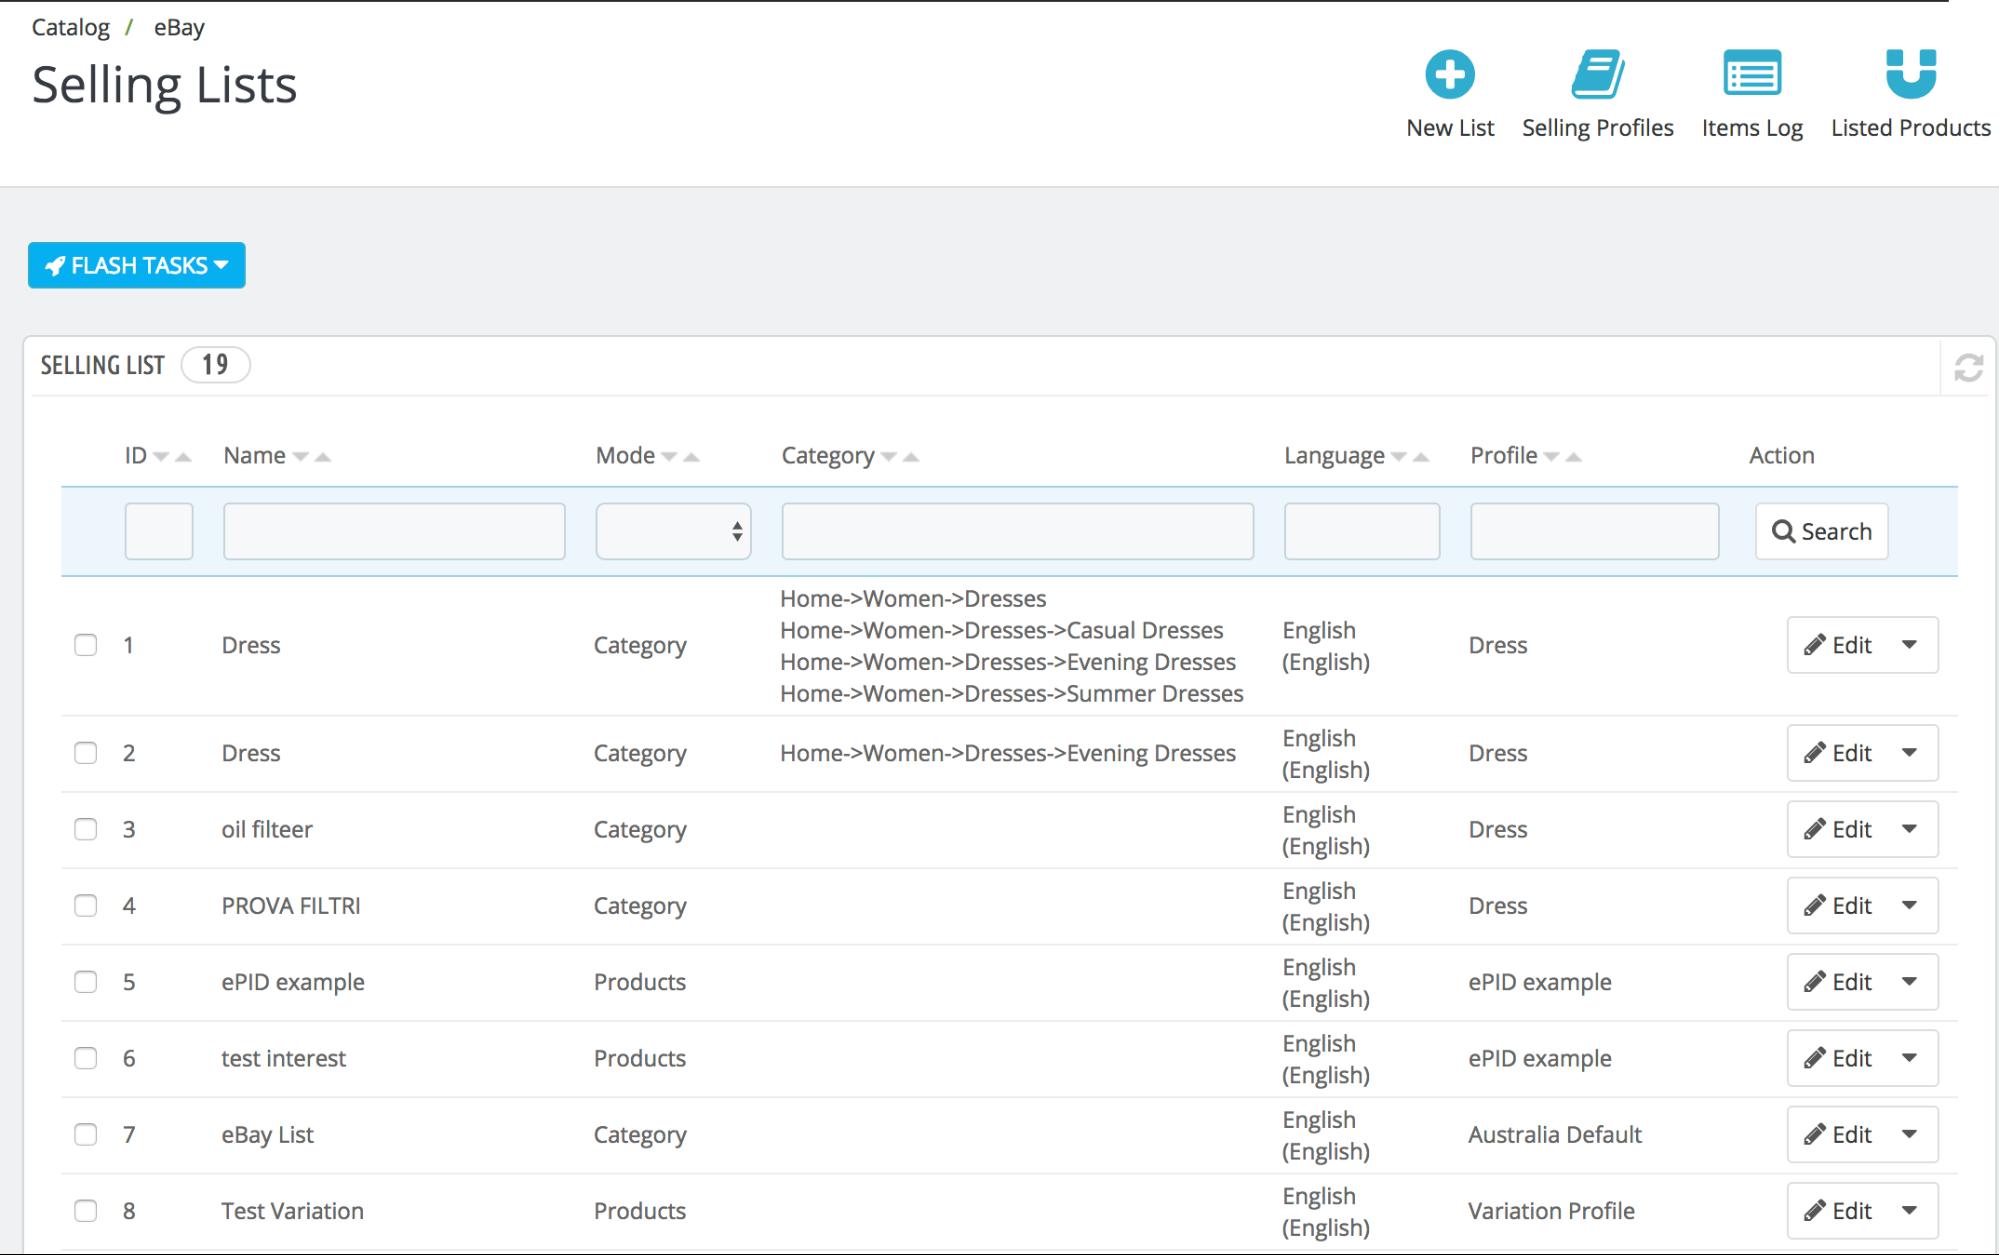 PrestaShop ebay module — Selling List